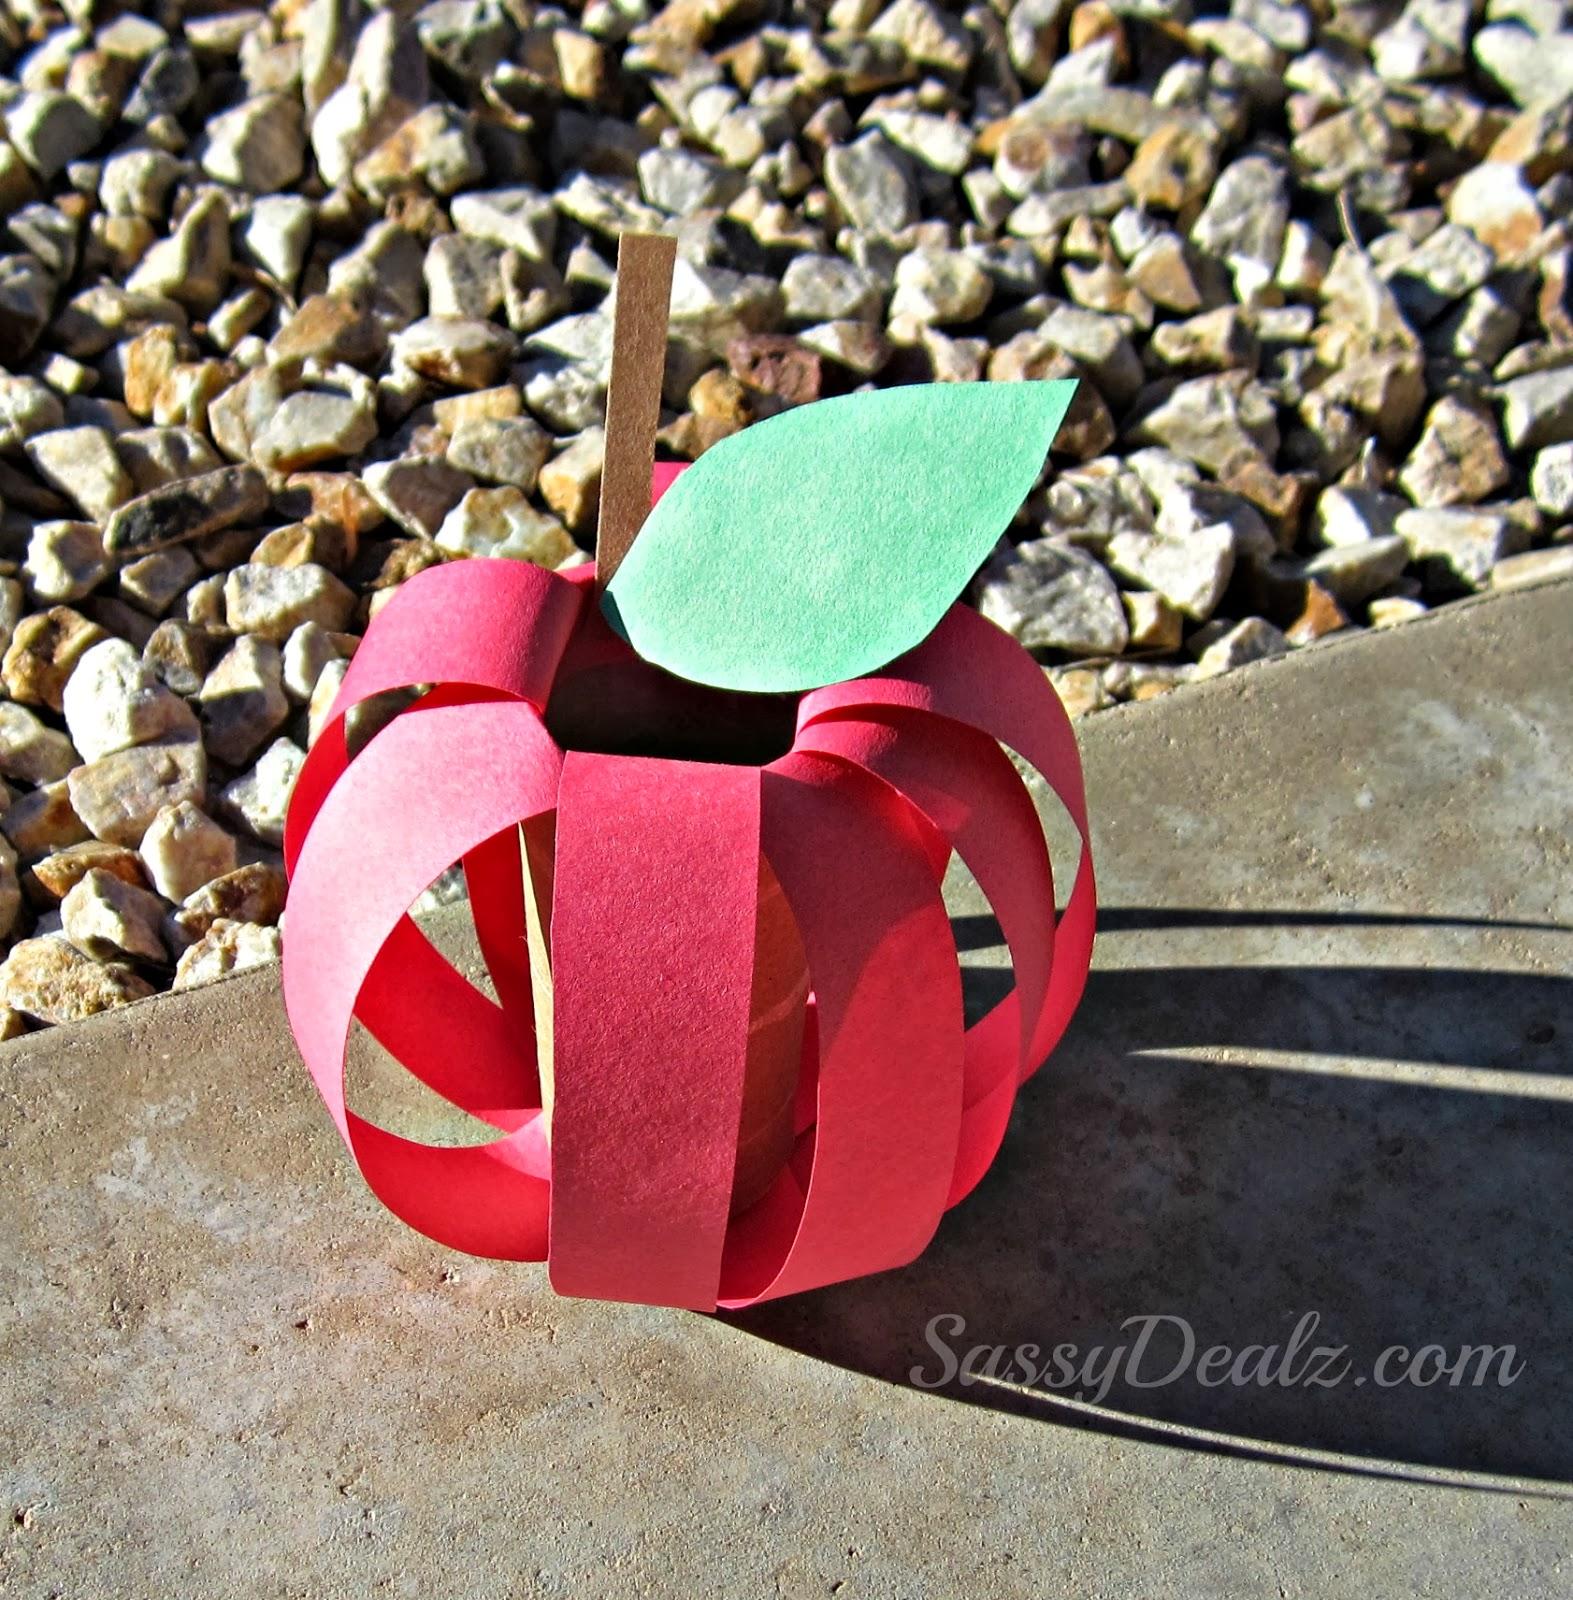 Diy apple toilet paper roll craft for kids crafty morning - Sassydeals com ...